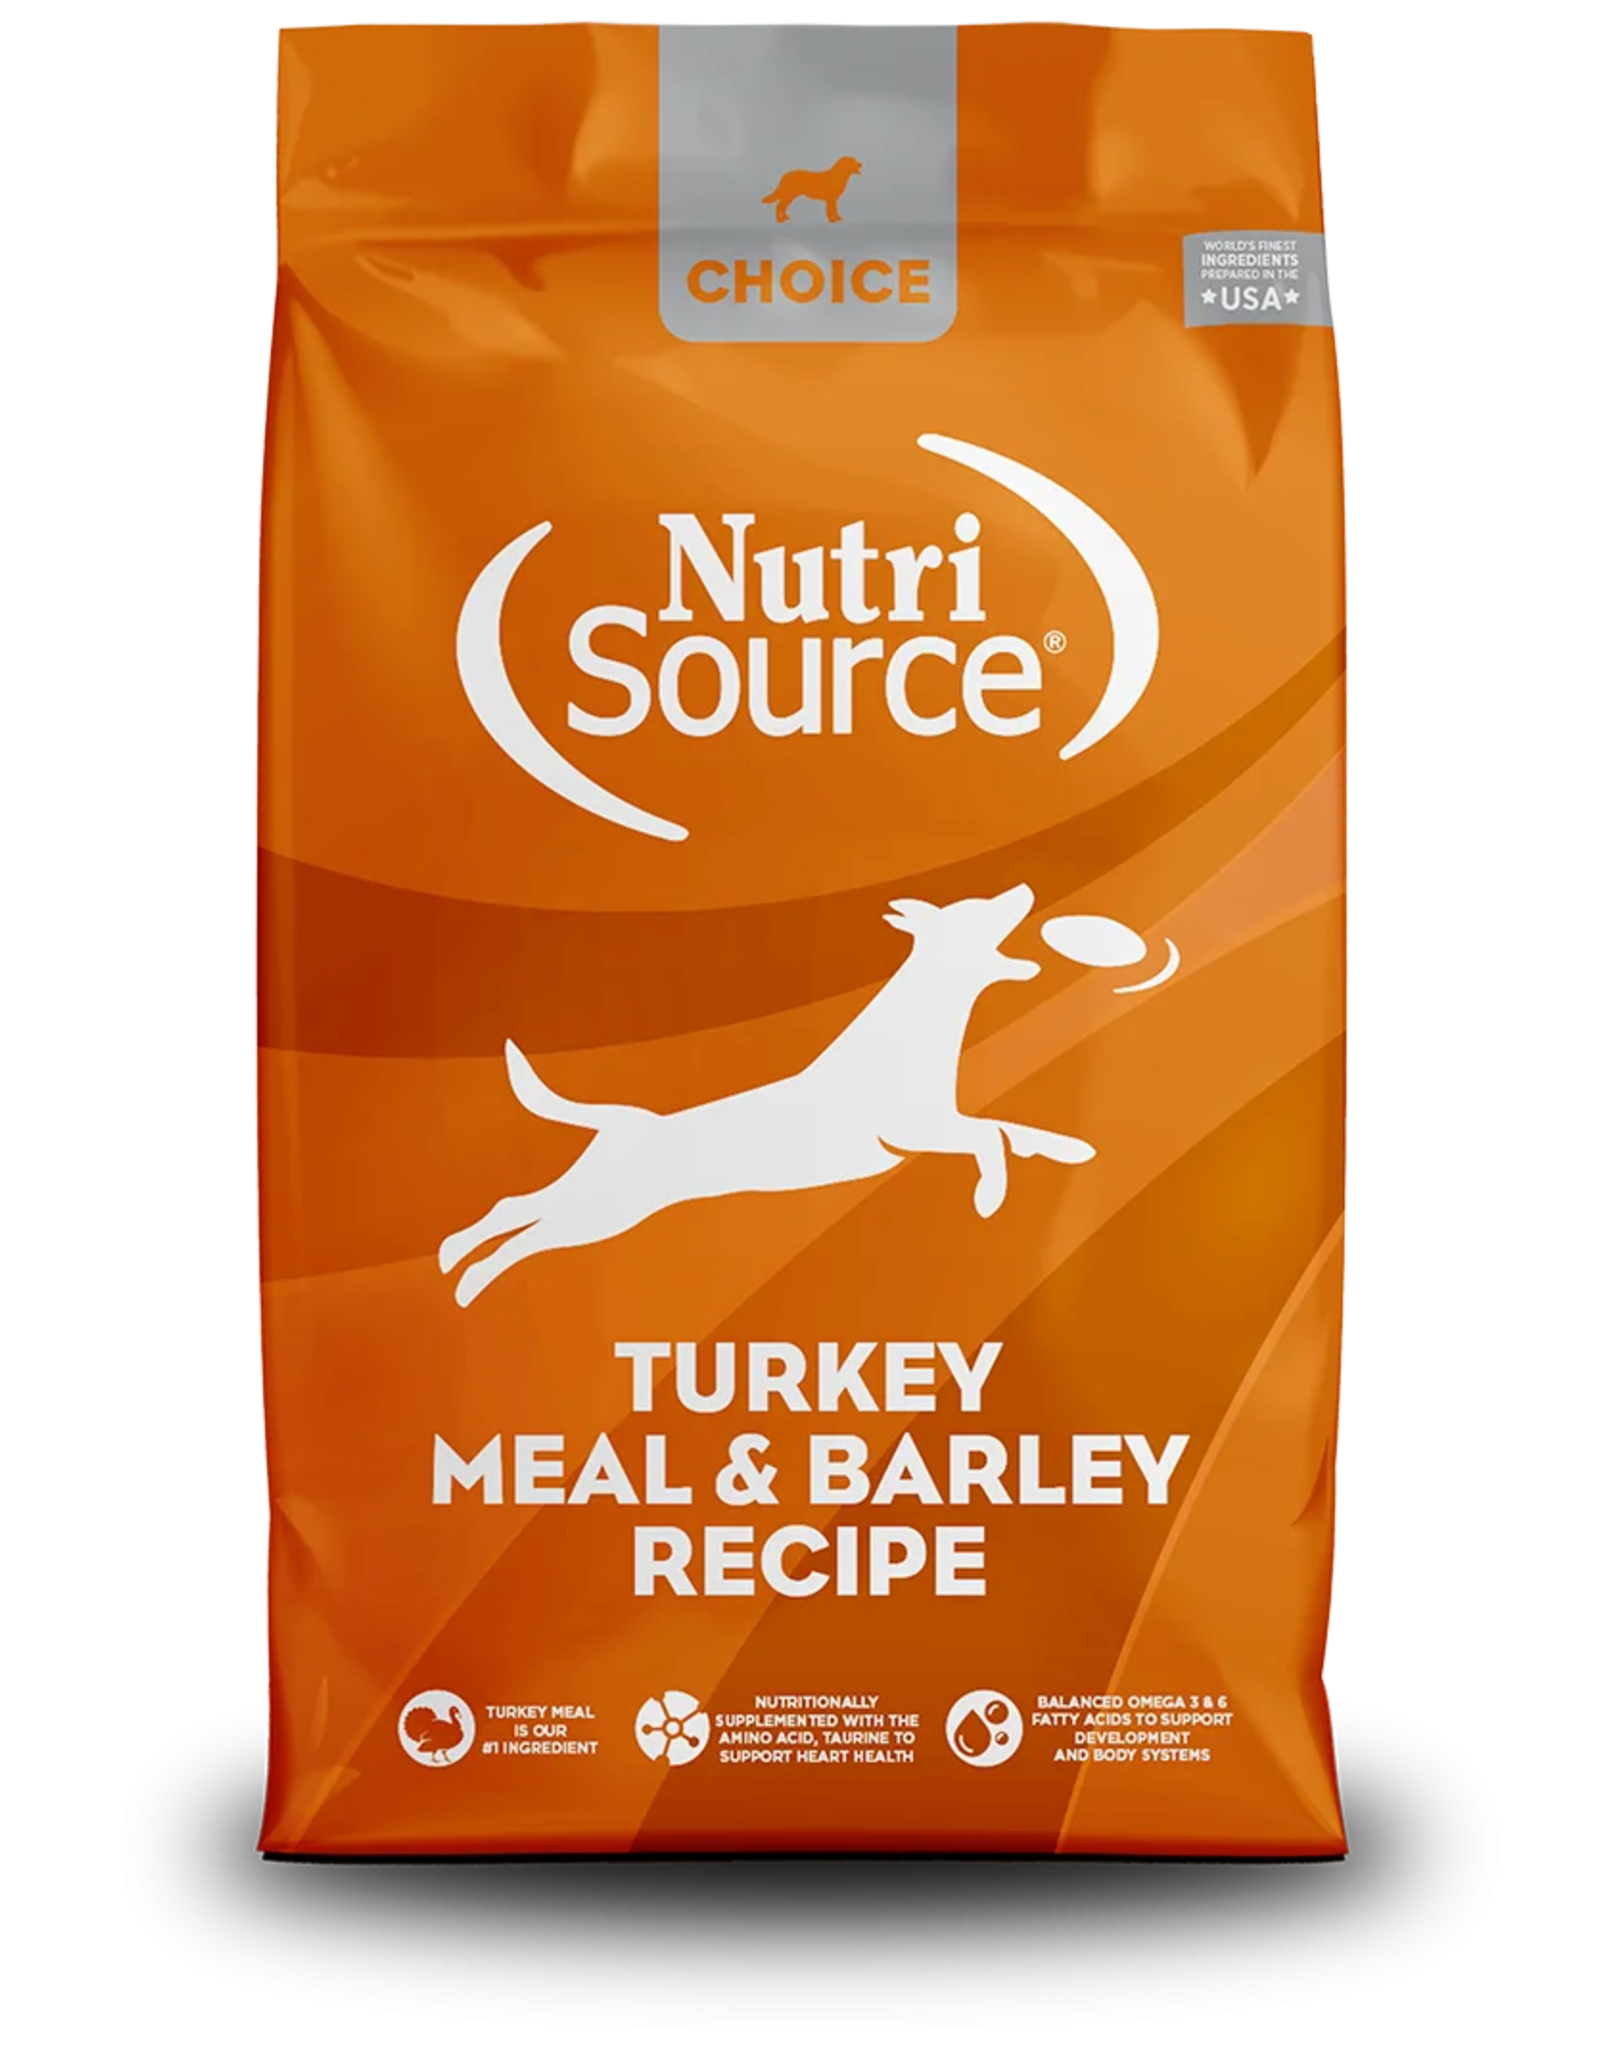 NutriSource Pet Foods NUTRISOURCE DOG CHOICE TURKEY MEAL & BARLEY RECIPE